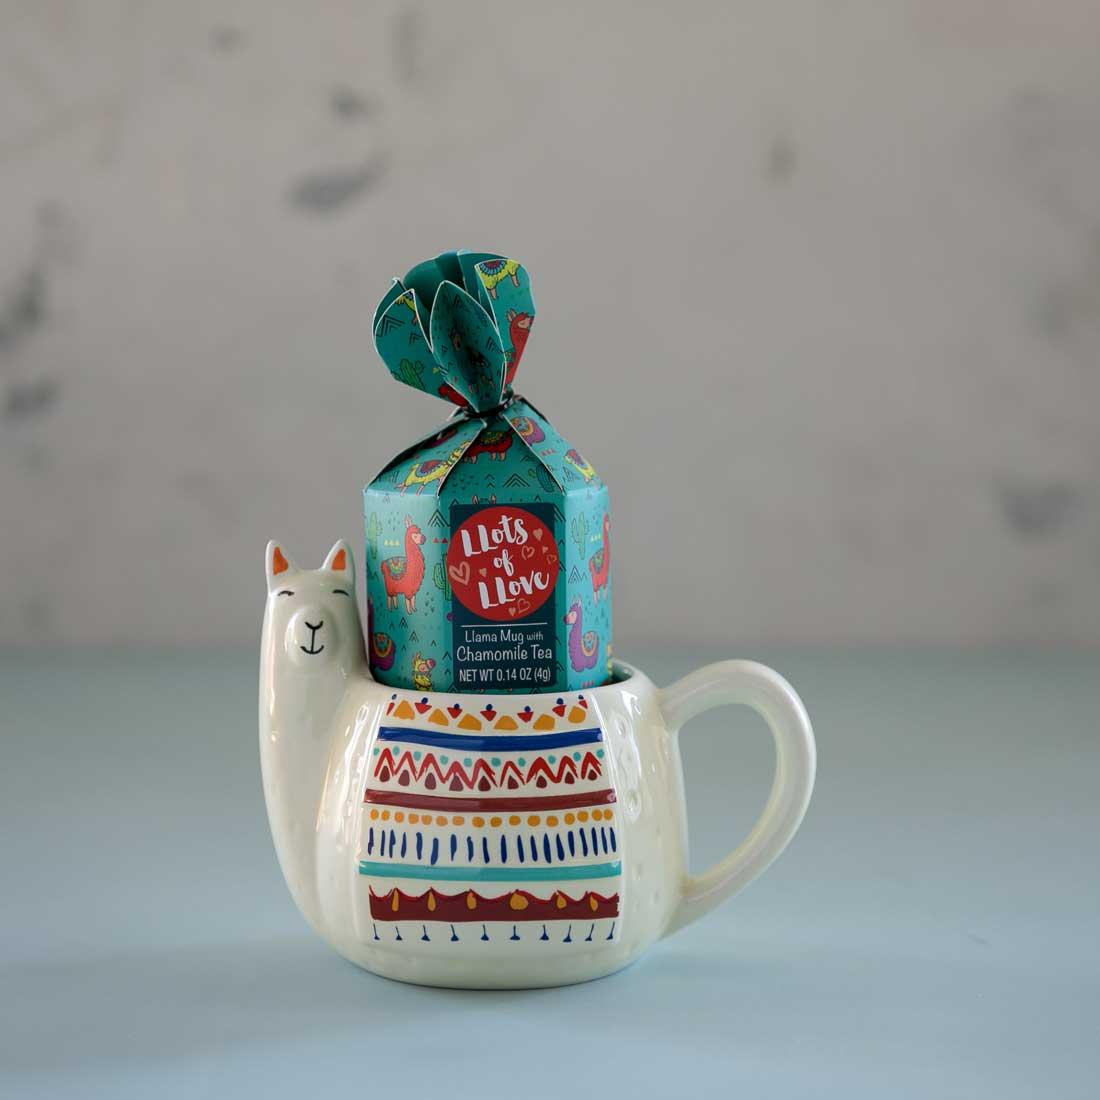 Llama Mug and Tea Set